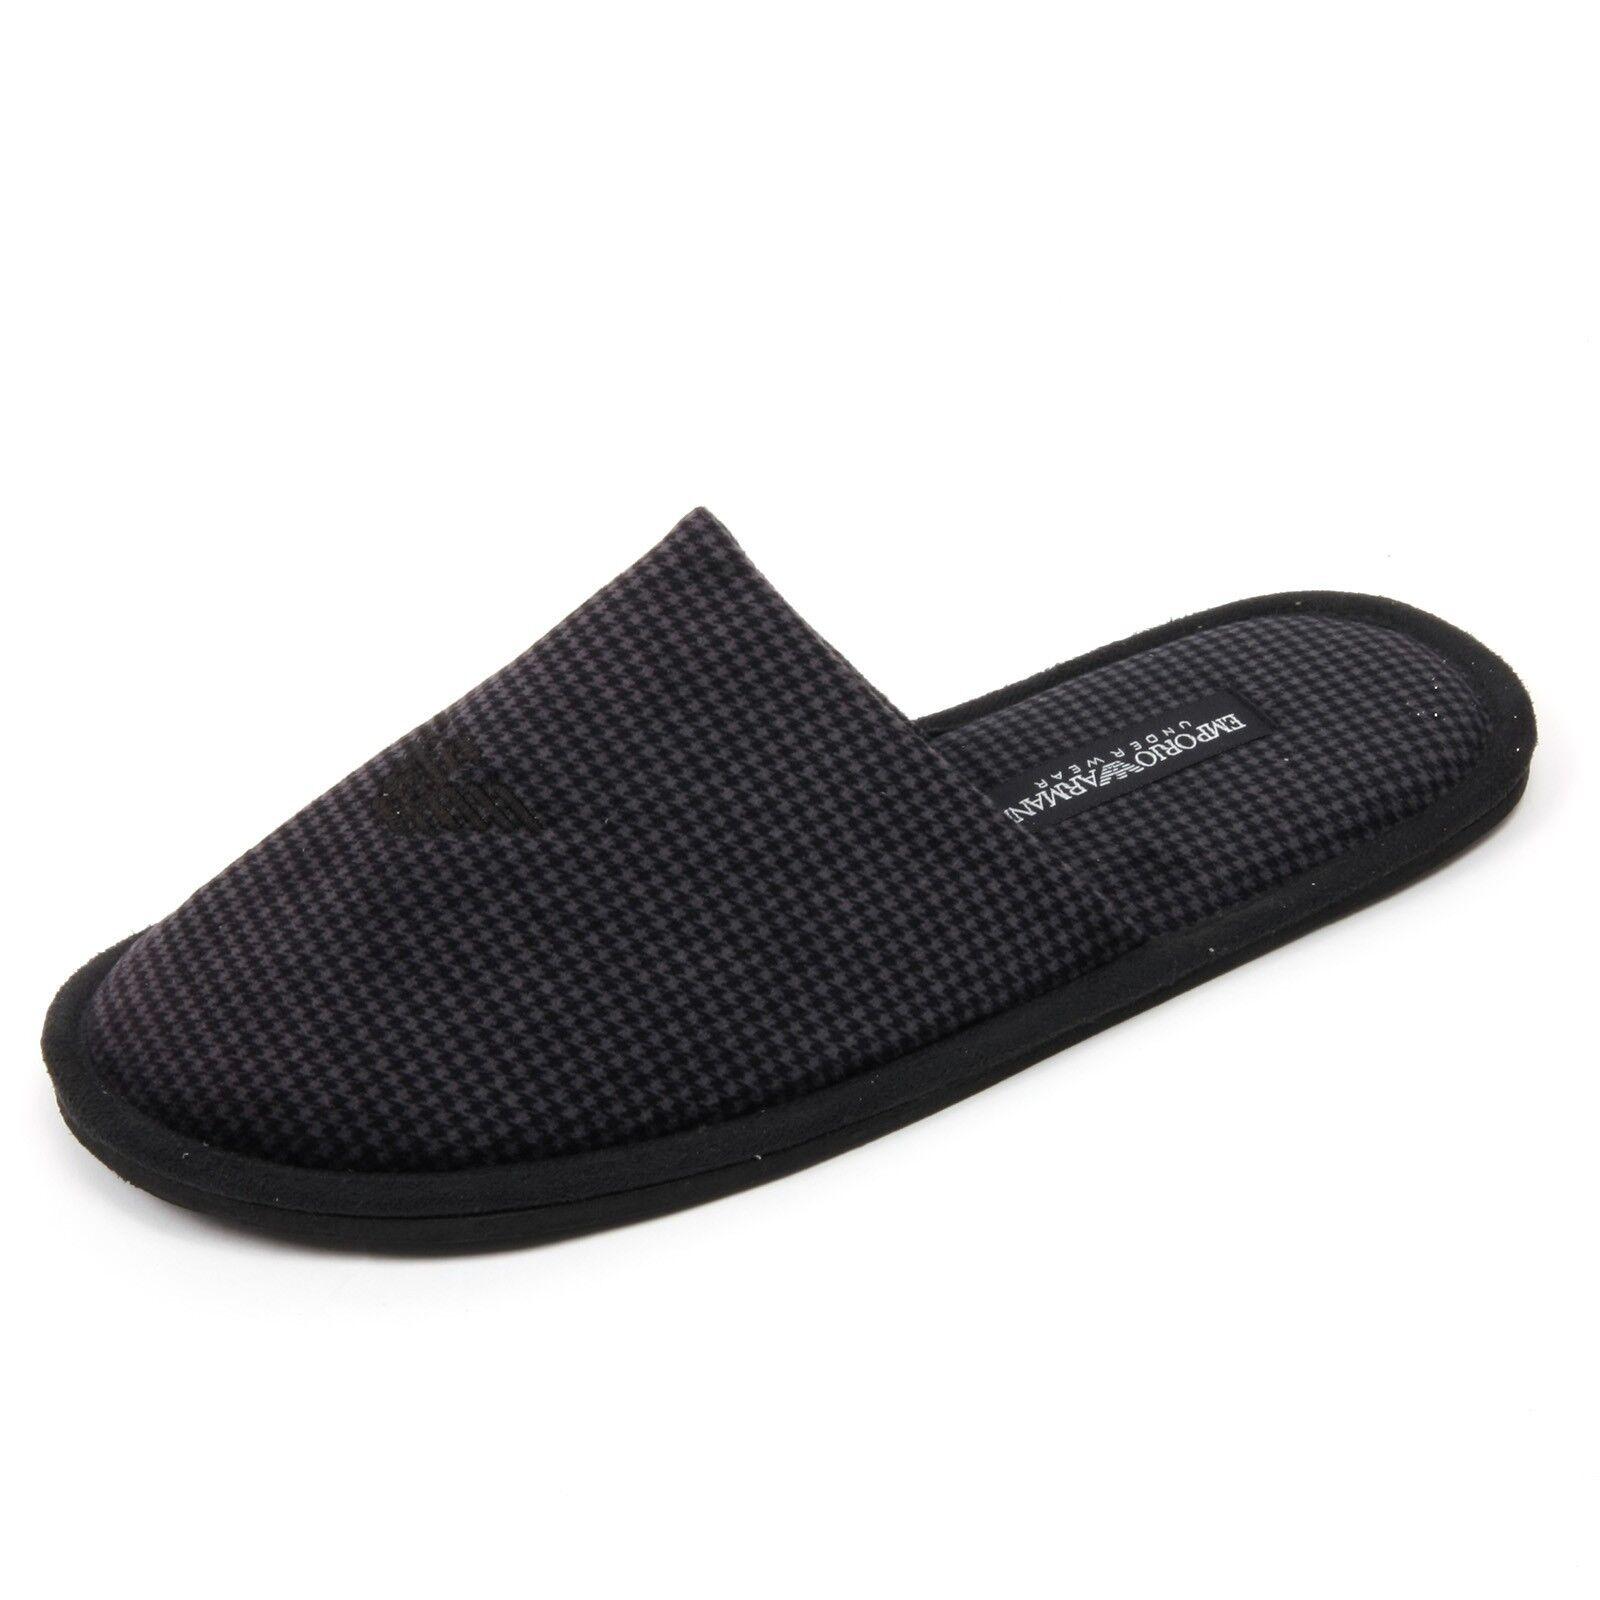 C1890 pantofola nero/grigio da casa uomo EMPORIO ARMANI nero/grigio pantofola slipper shoe man 3174ca